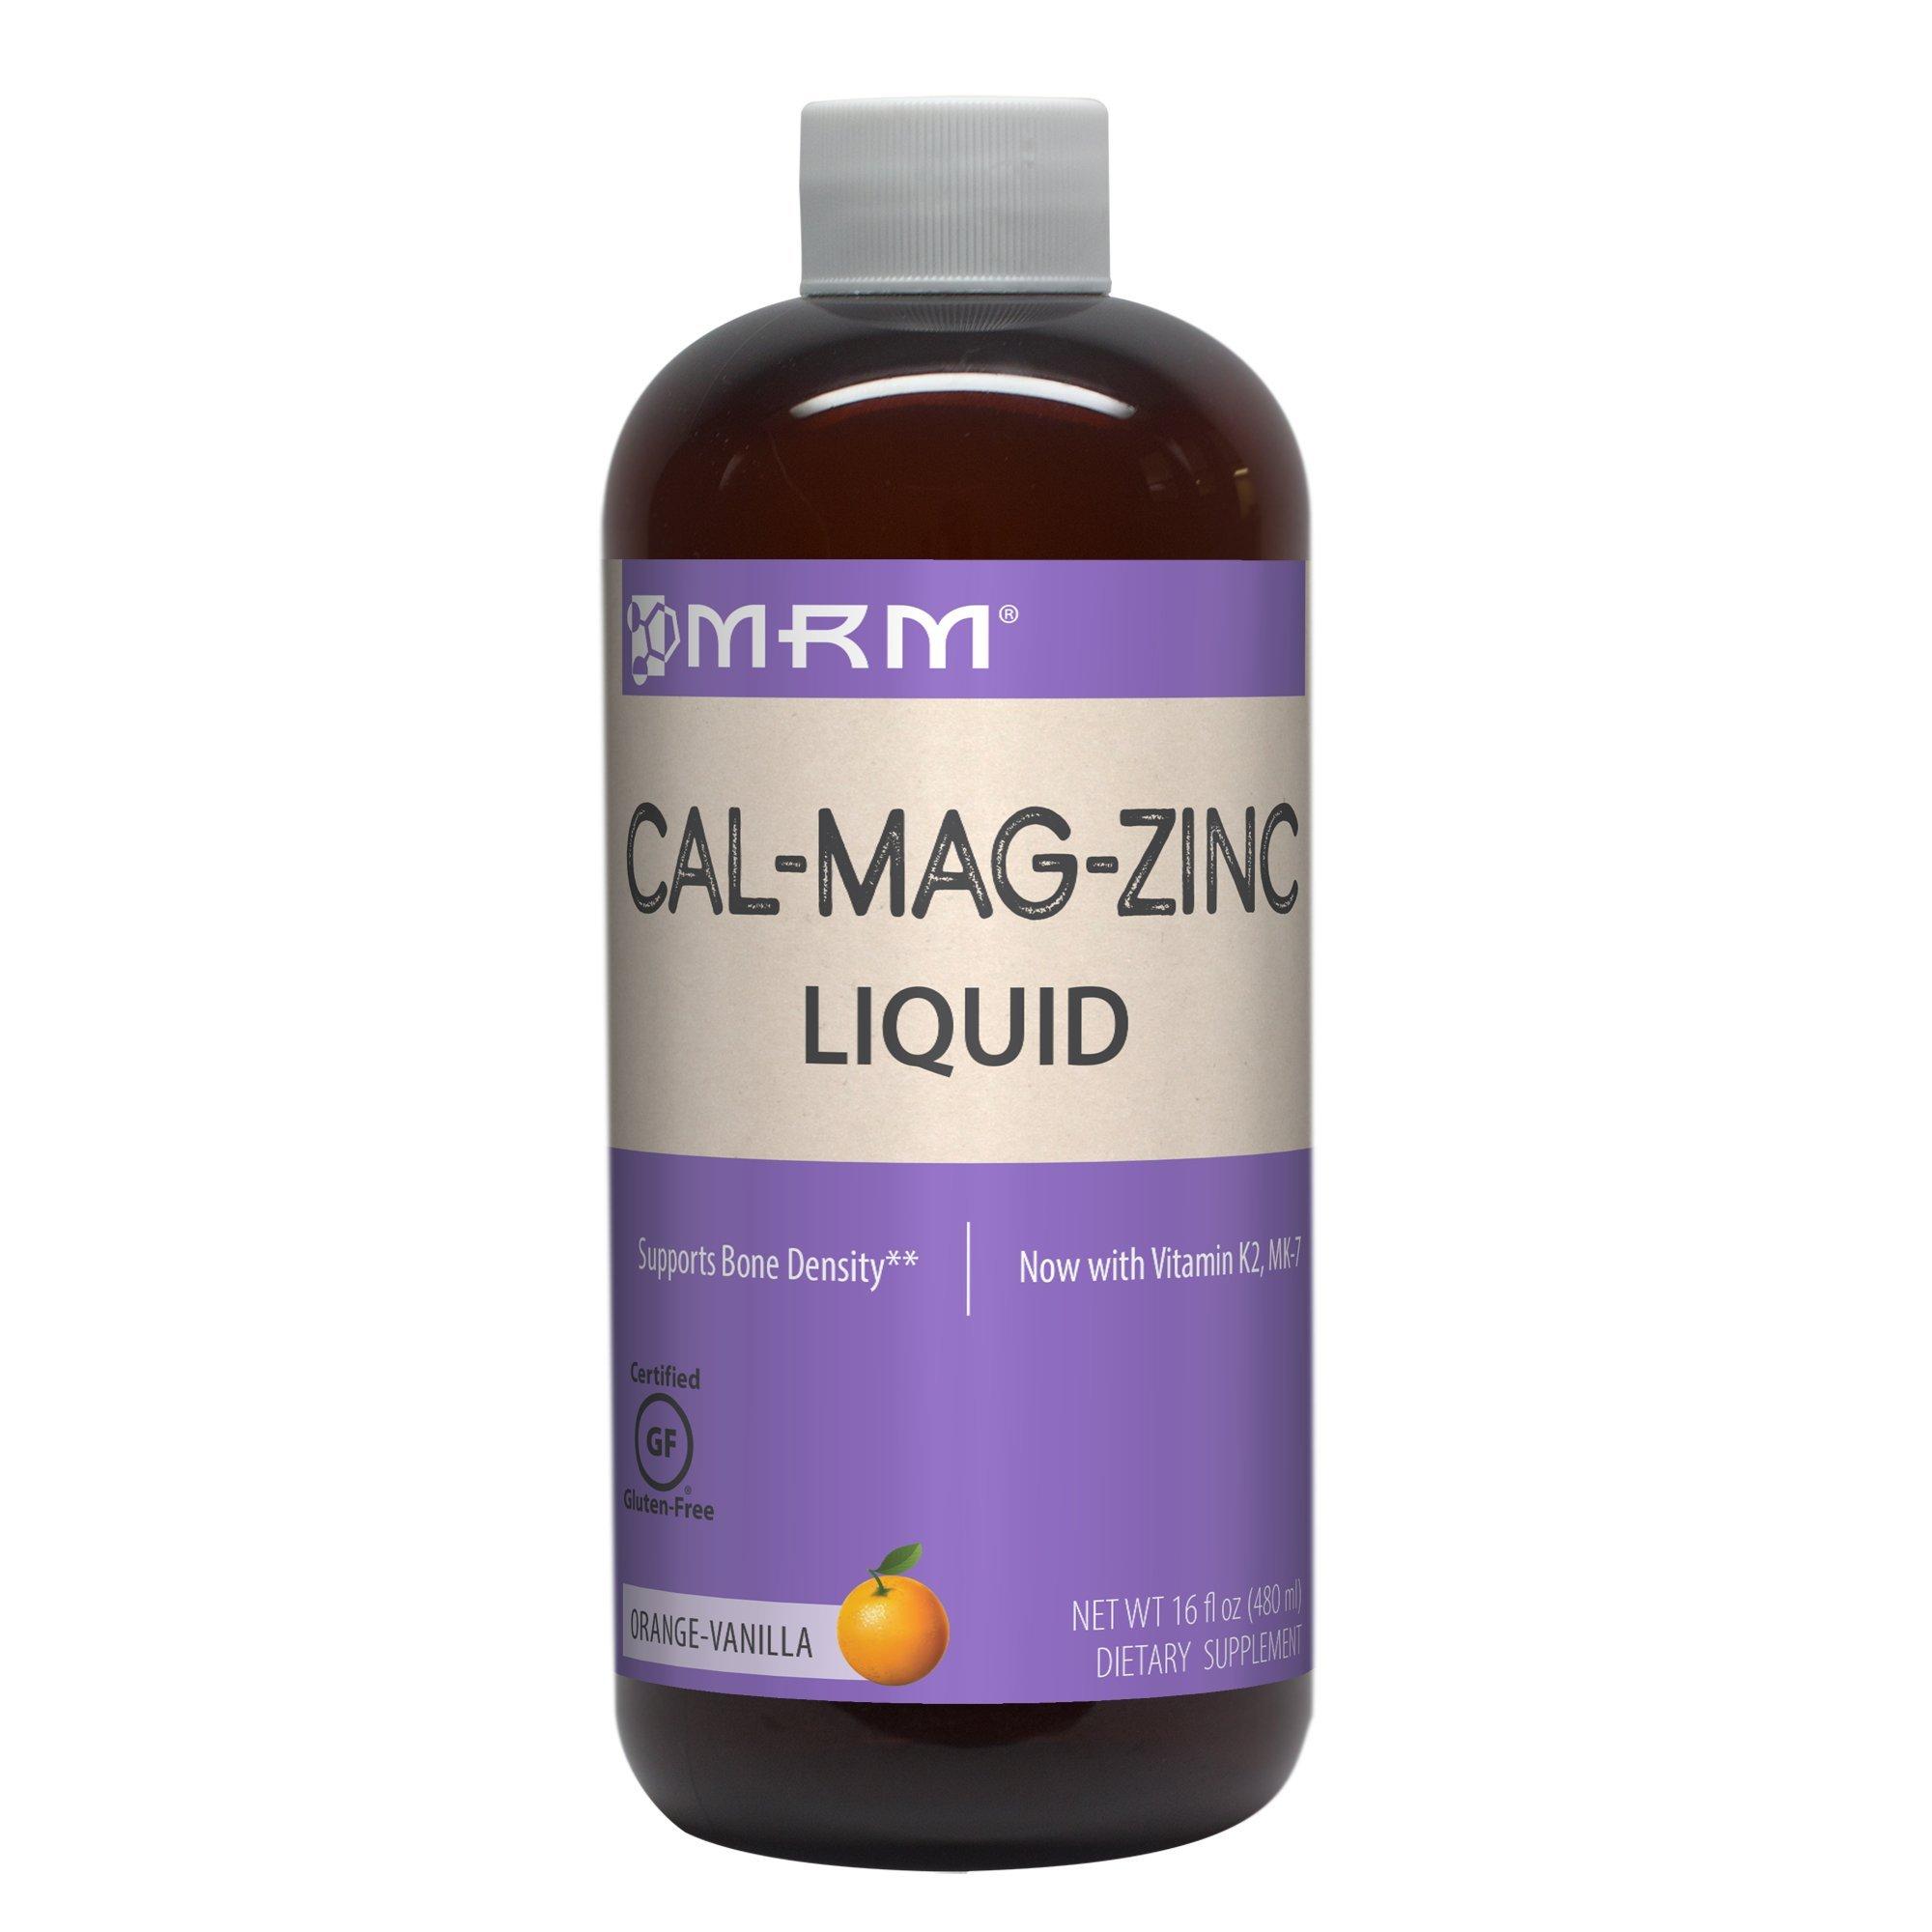 Cal-Mag-Zinc Liquid (Vanilla-Orange Flavor 16oz) Great Tasting!